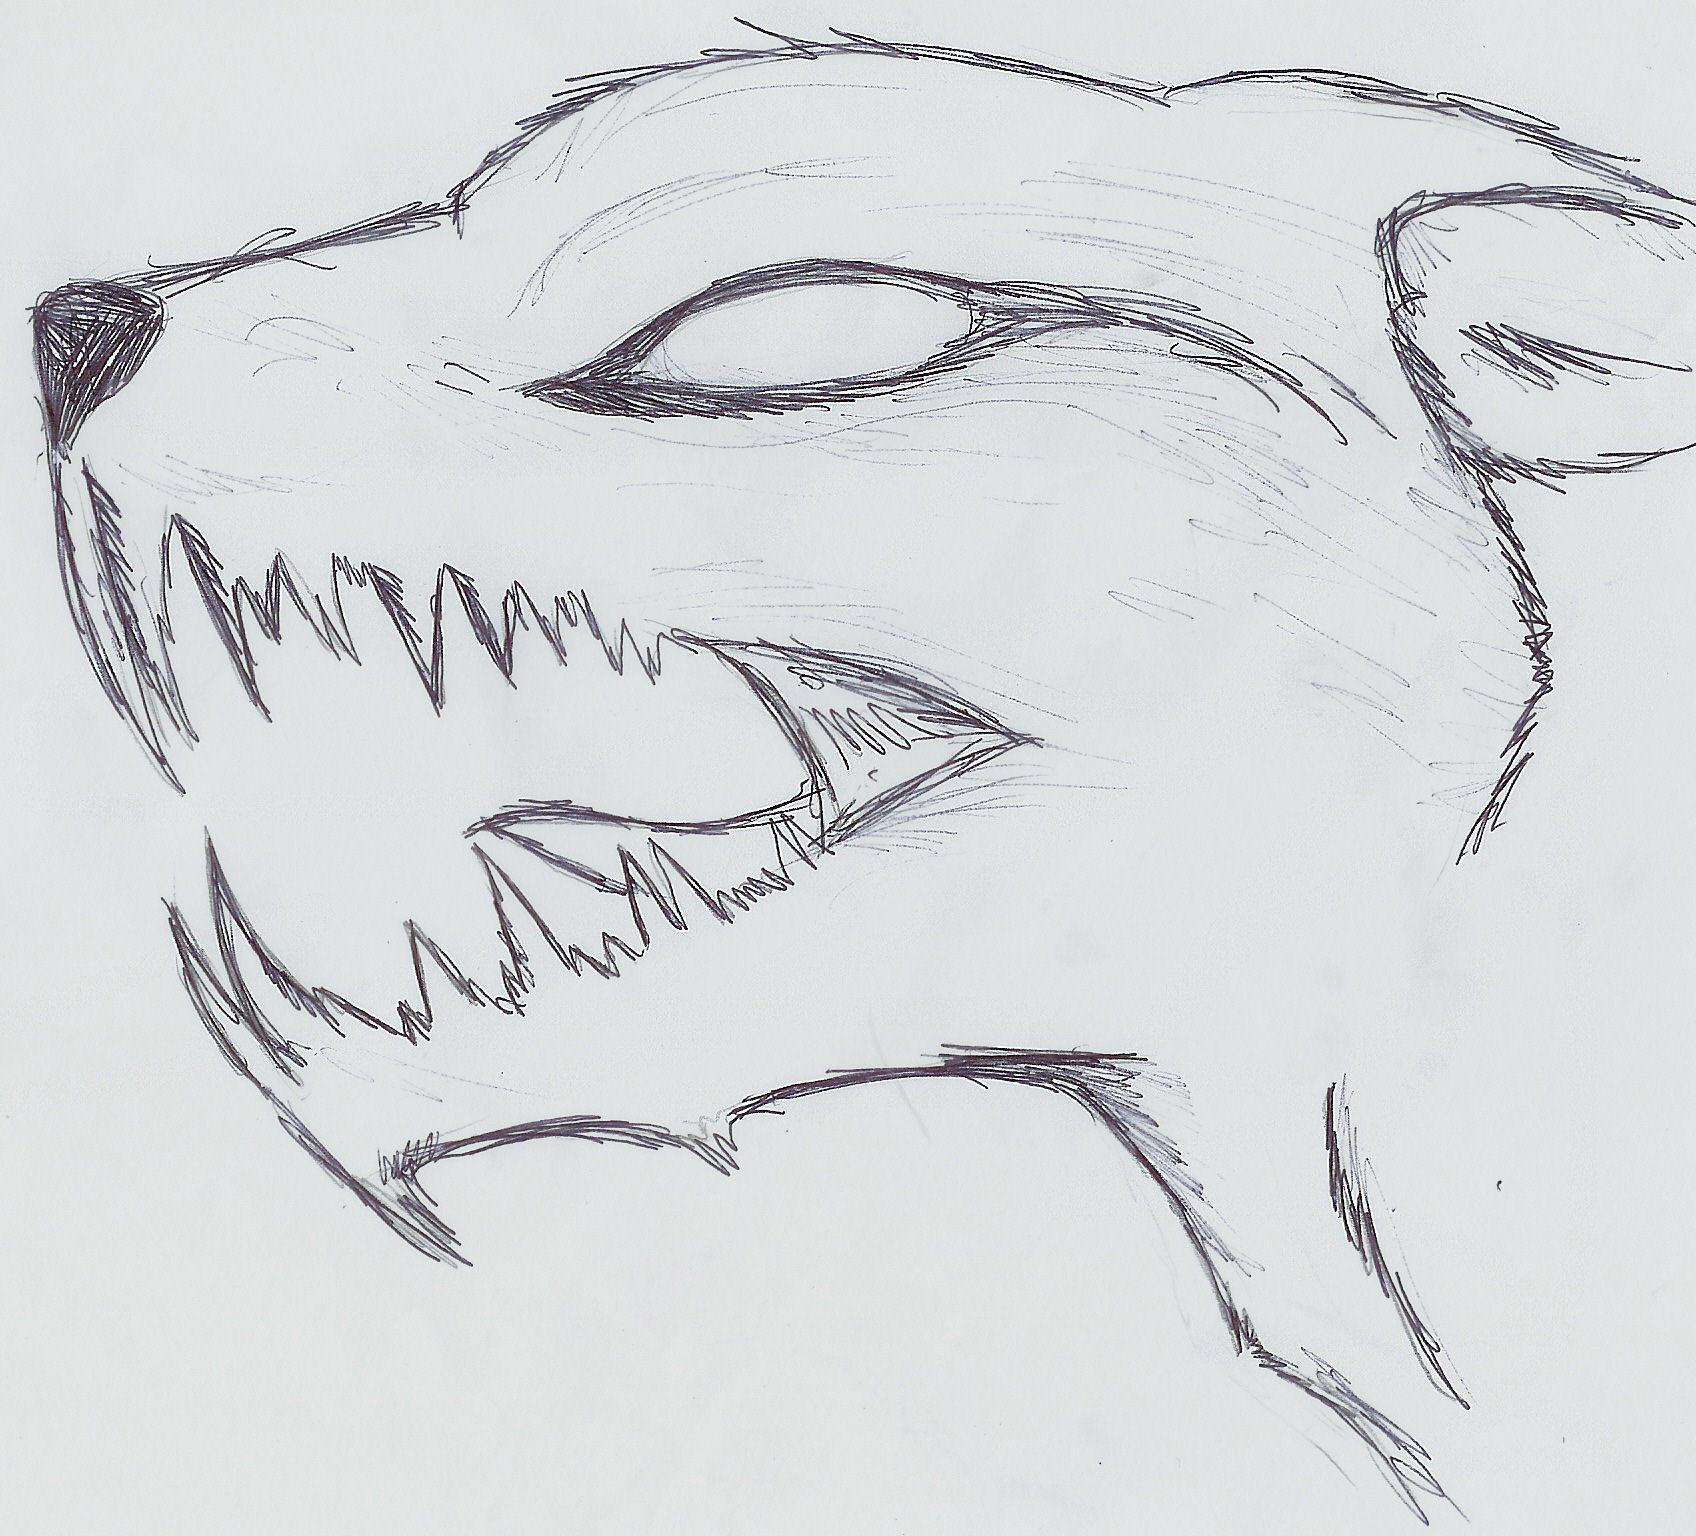 Demon wolf by chrysaetos-pteron on DeviantArt